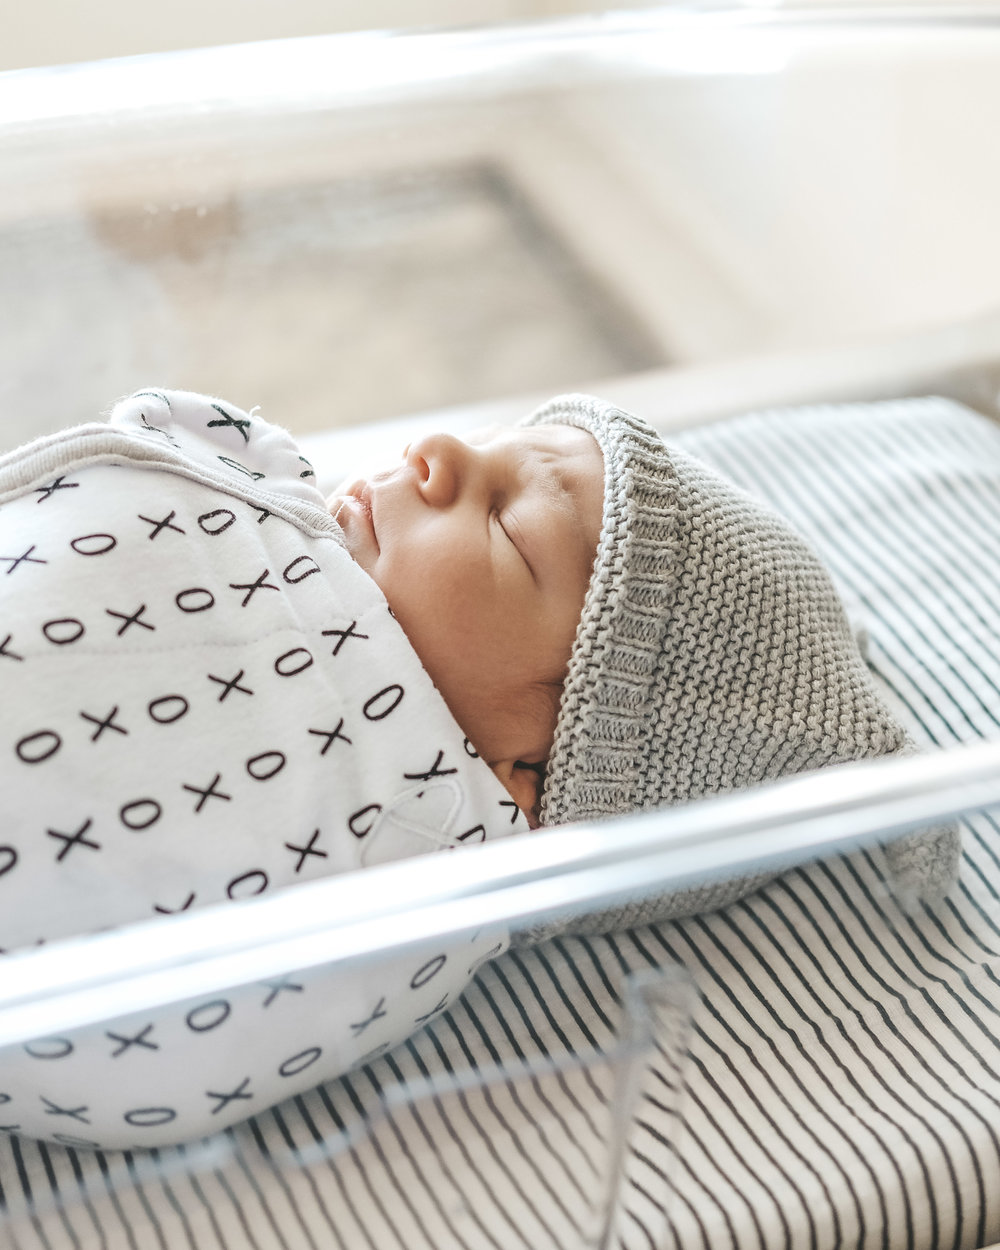 Jett Rose Jones, birth story, vacuum extraction birth story, 9 lb newborn baby boy, swaddle me organic swaddle.